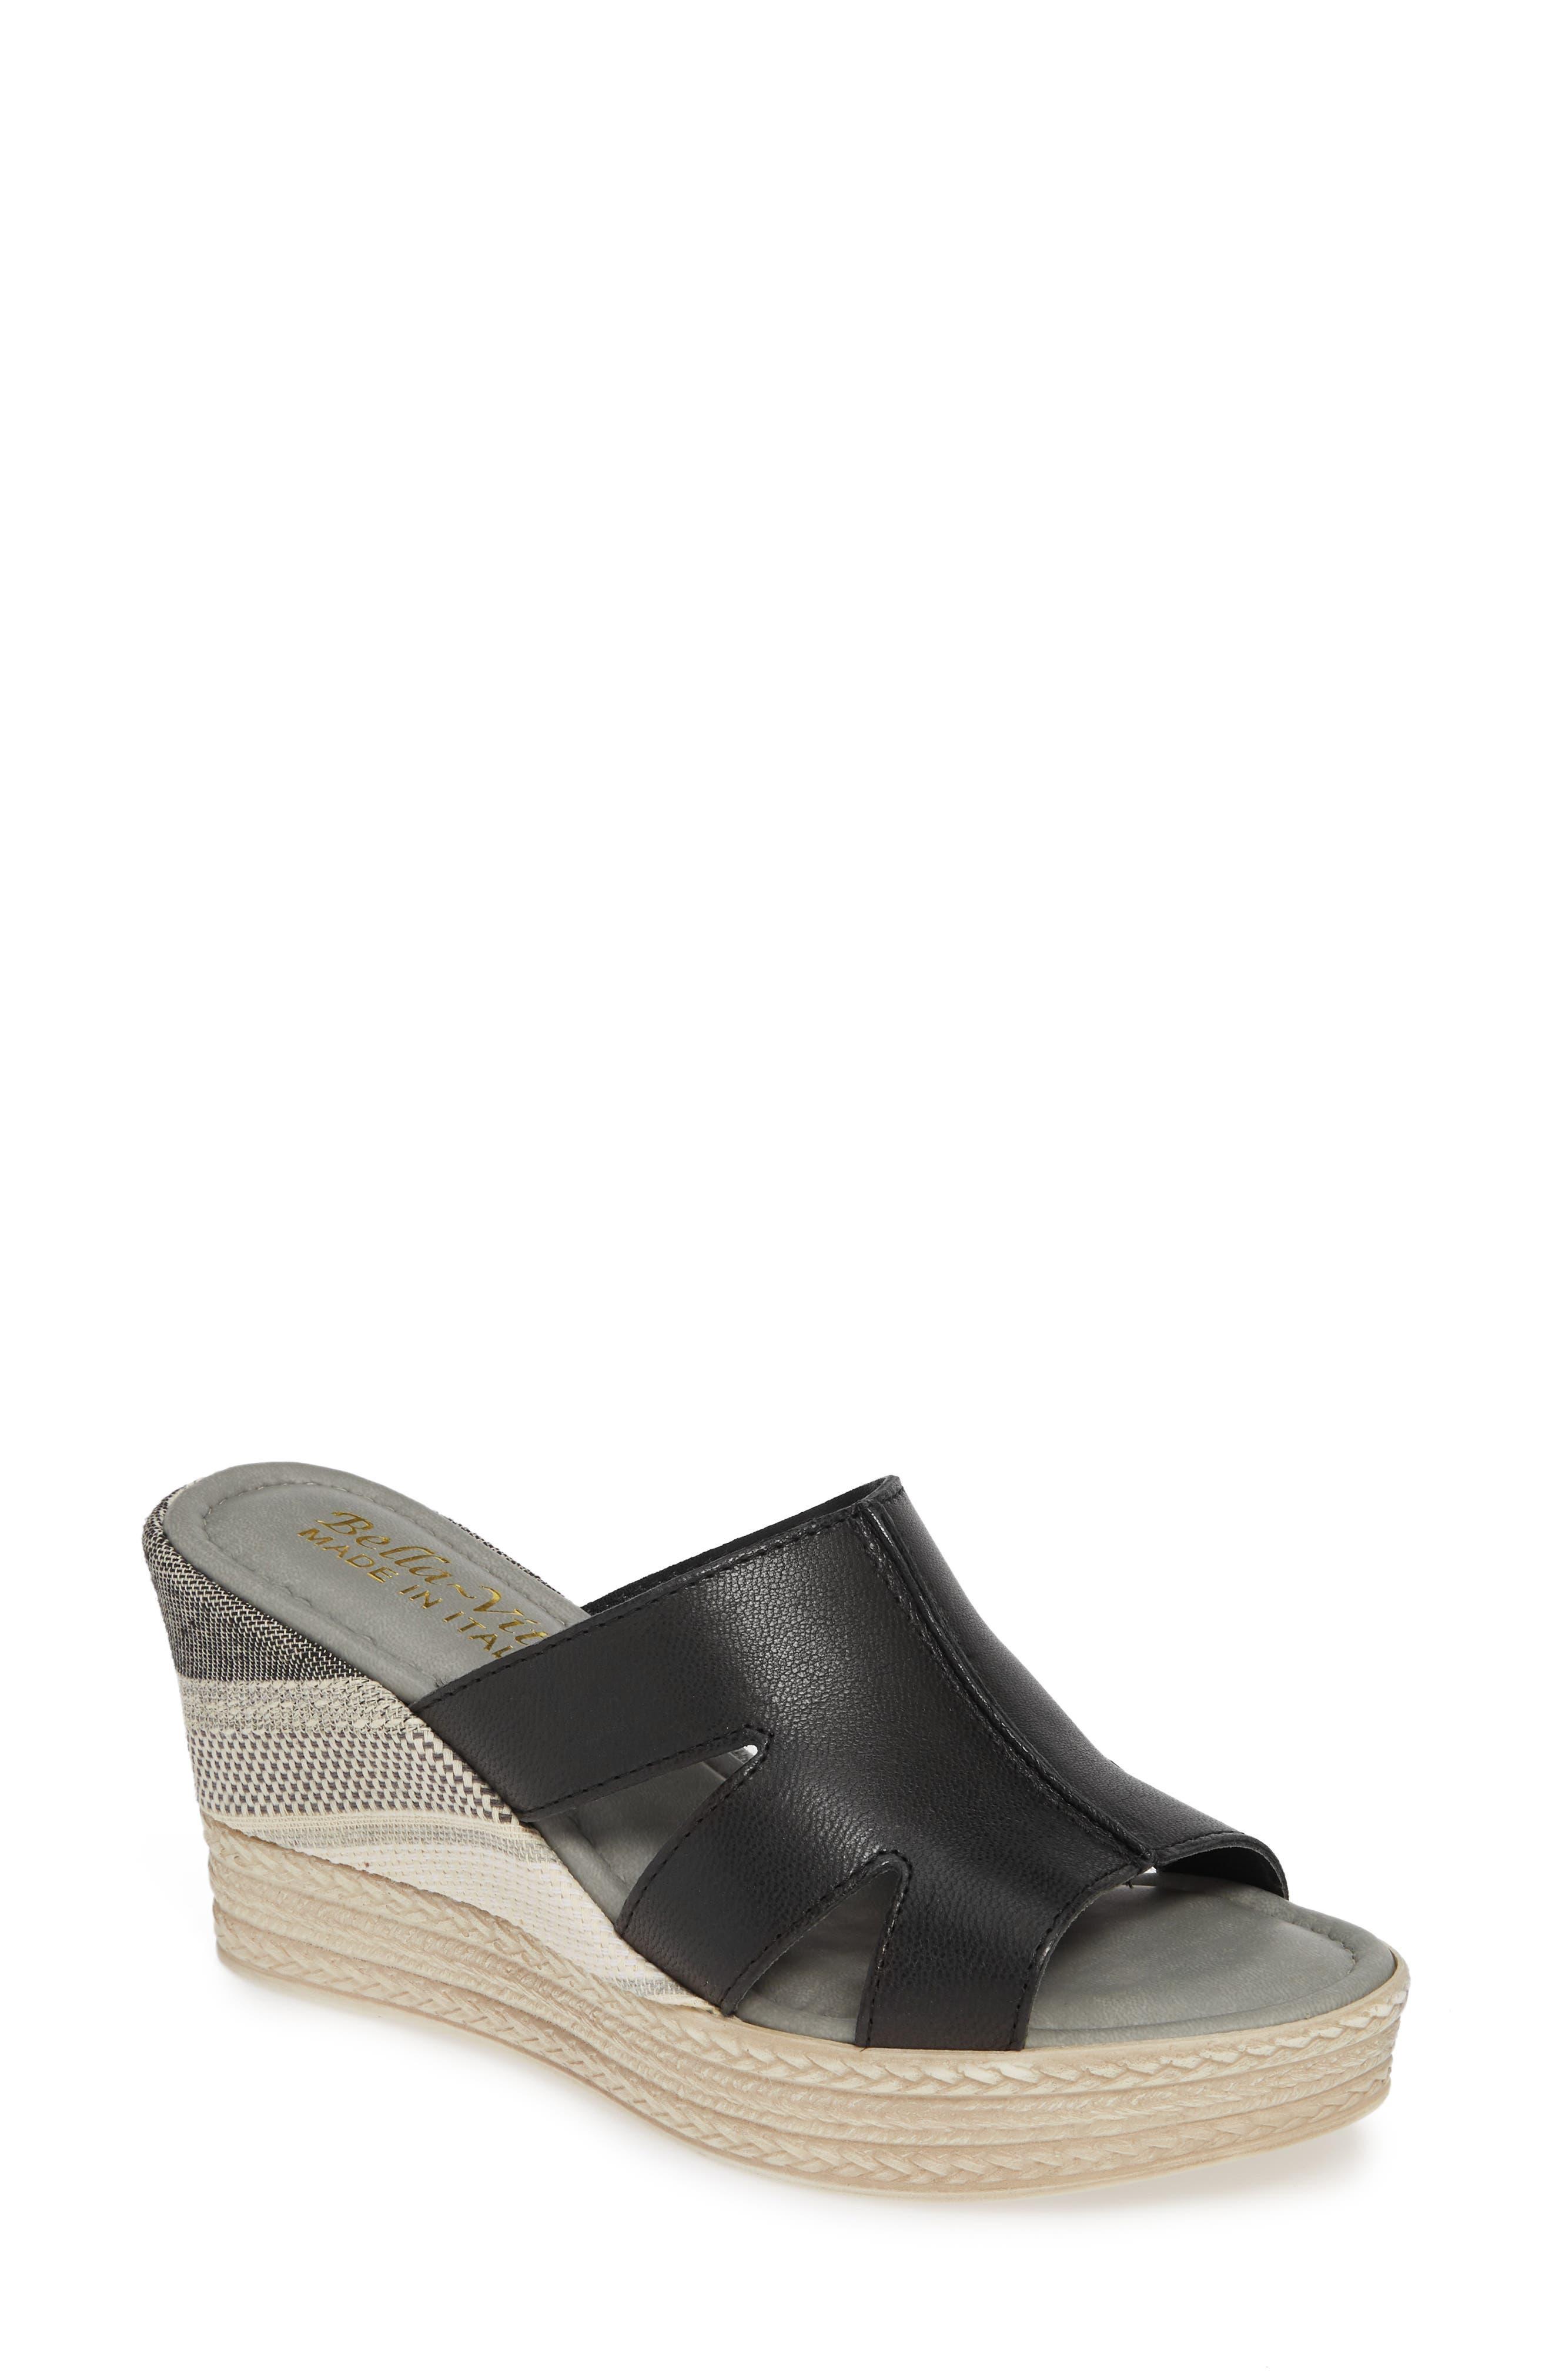 Rox Wedge Slide Sandal, Main, color, BLACK ITALIAN LEATHER